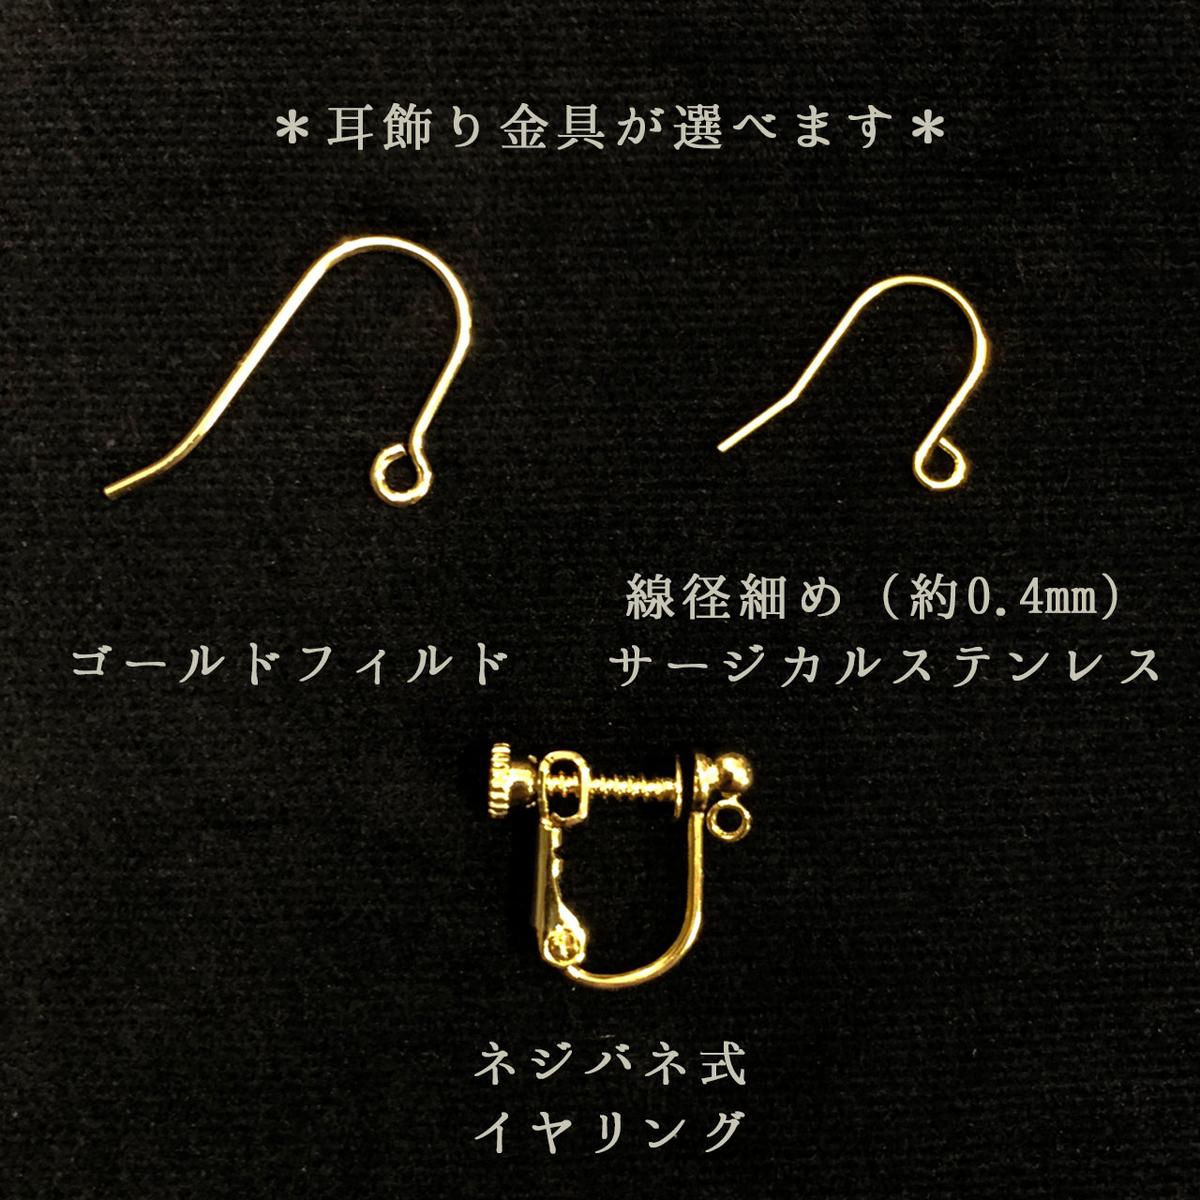 f:id:tsubame_bobbin:20201113220348j:plain